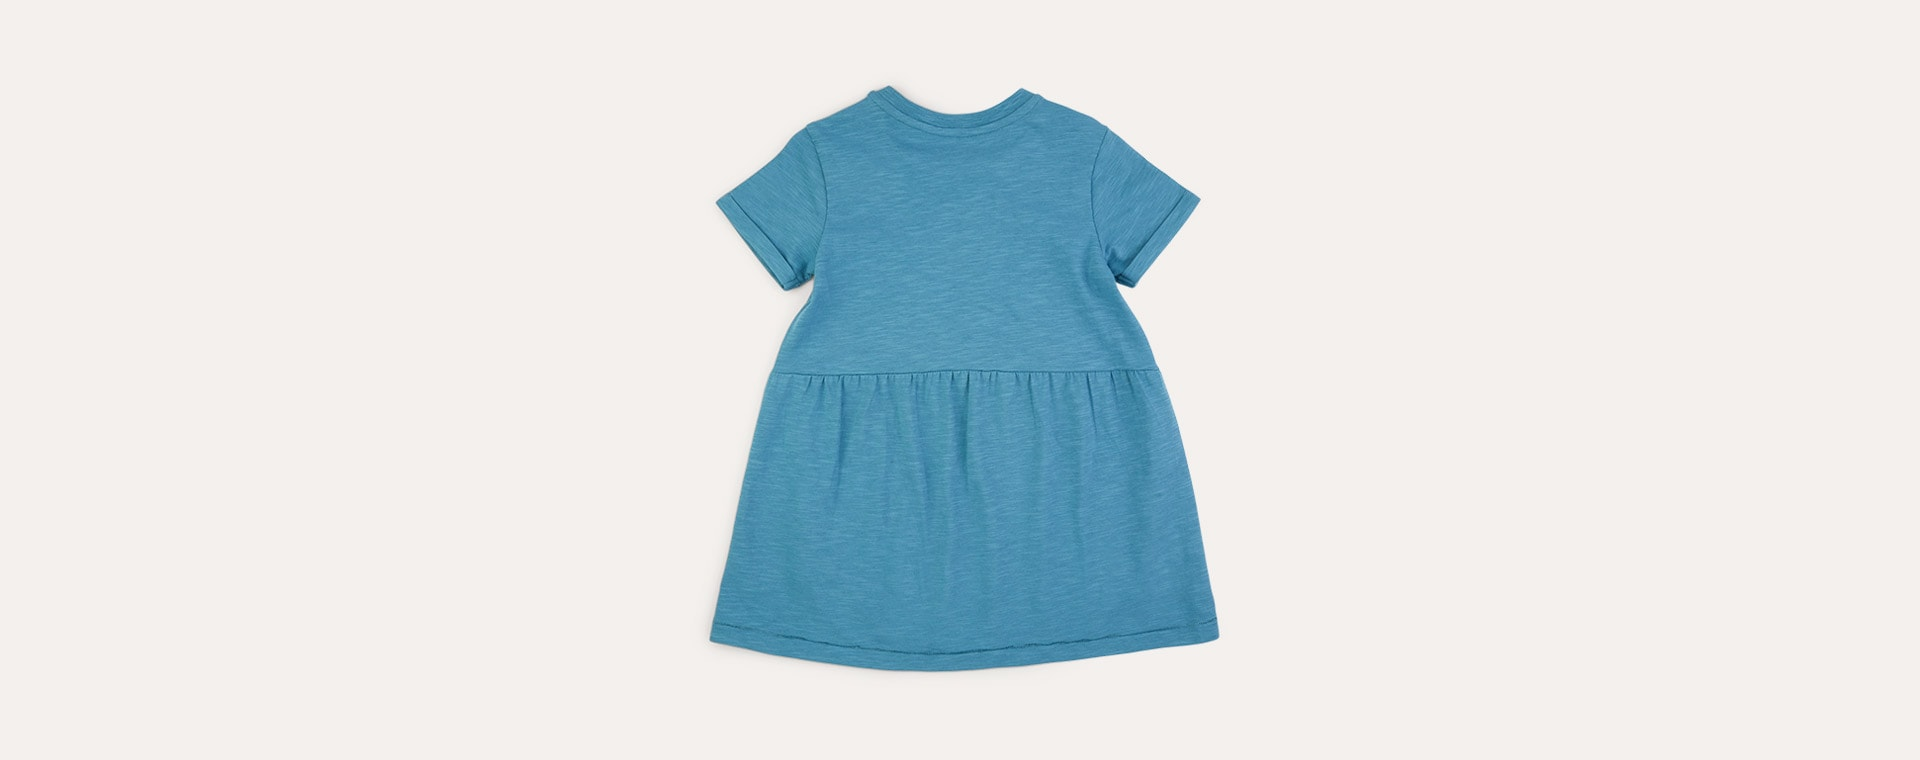 Aqua KIDLY Label Perfect Tee Dress